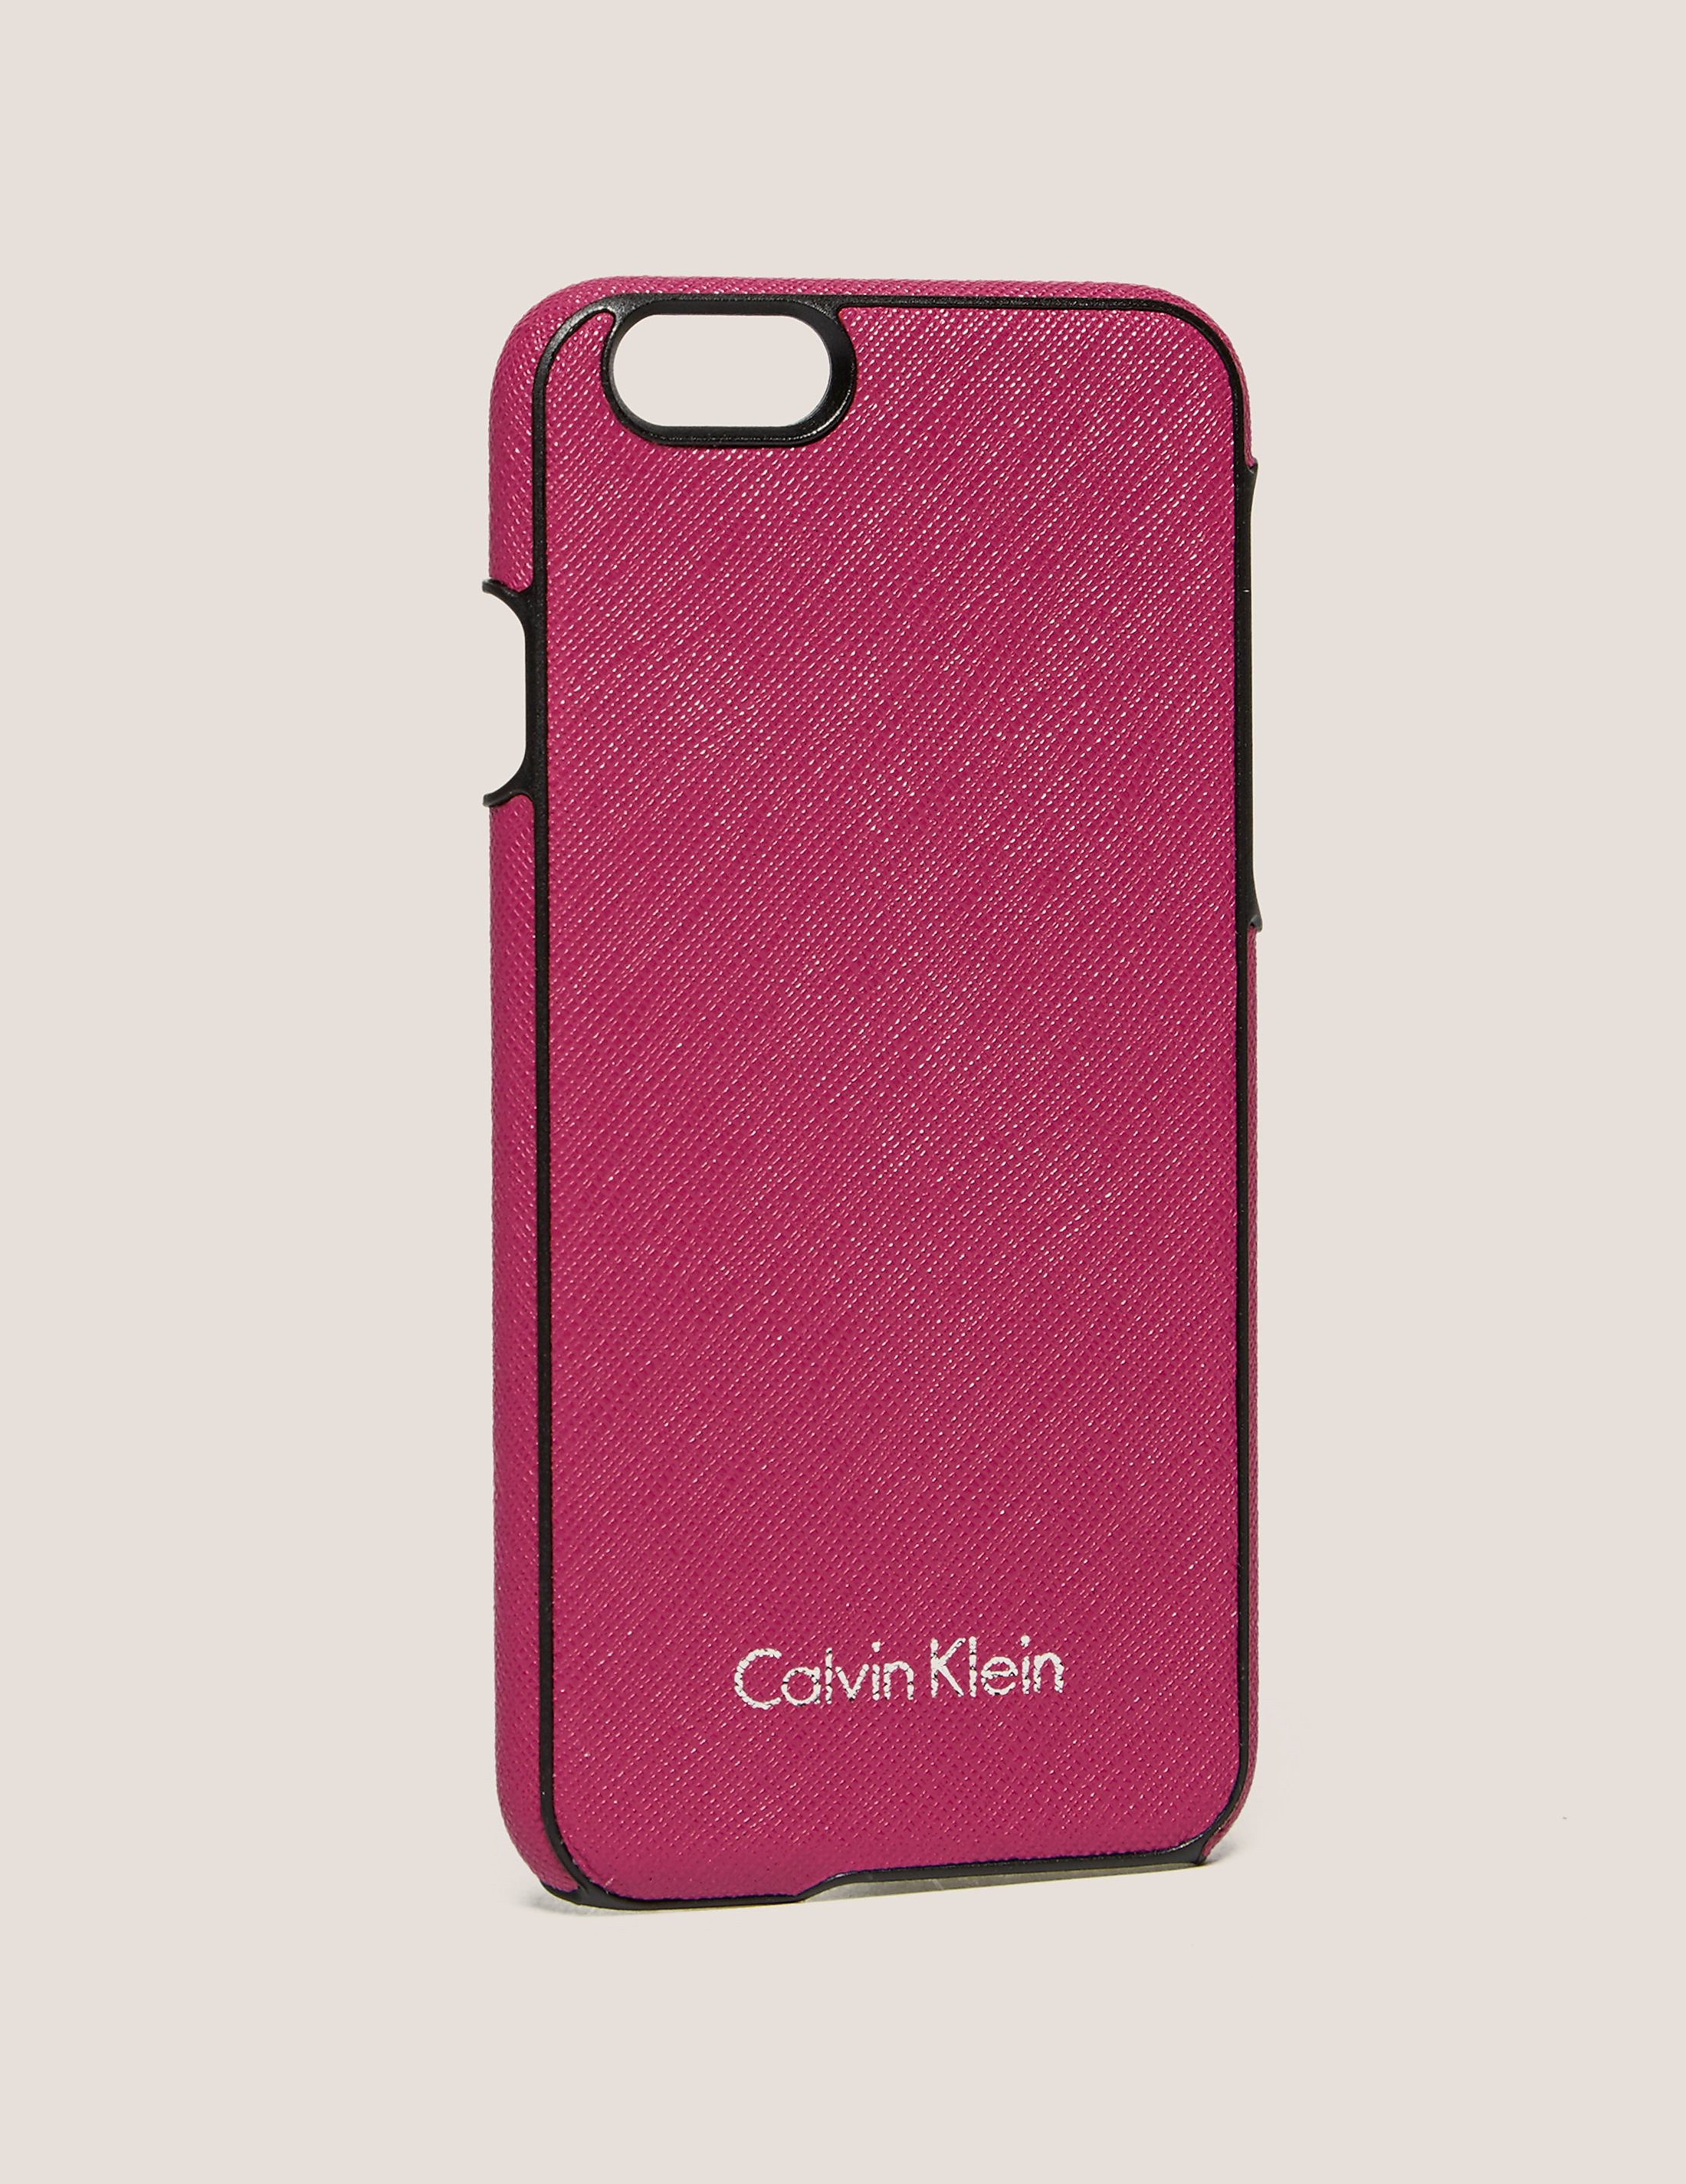 Calvin Klein Sofie IPhone cover